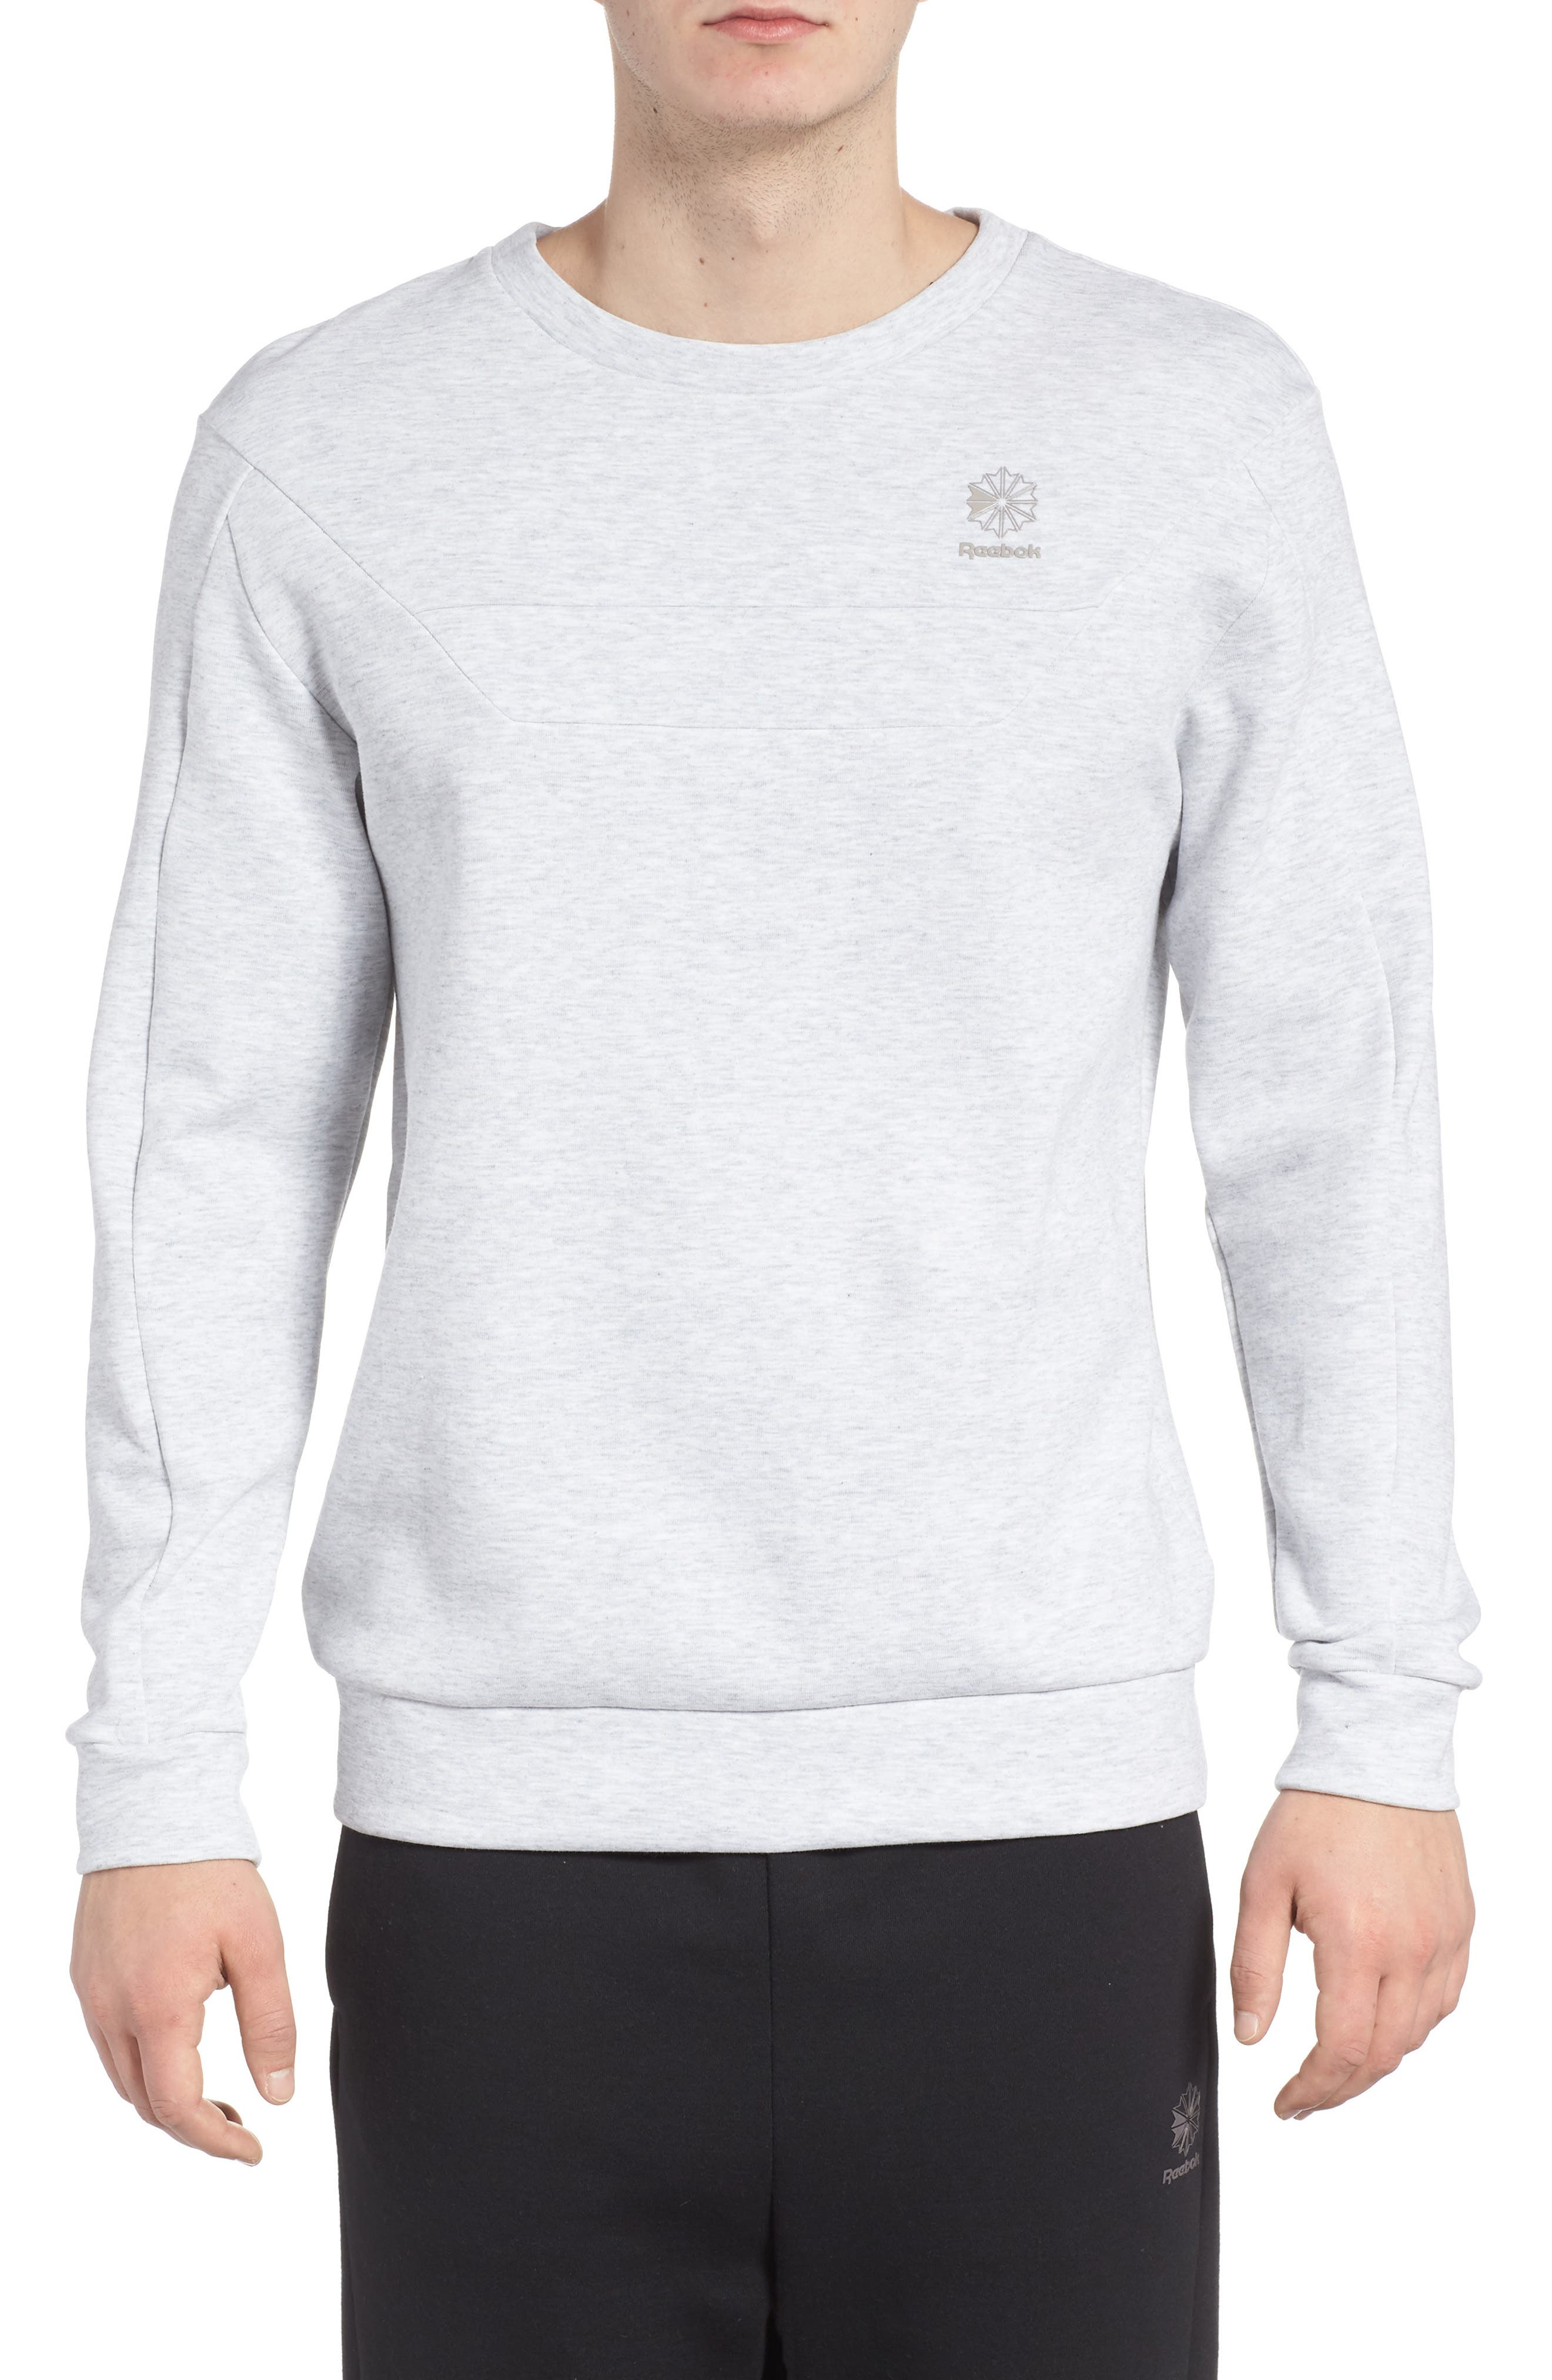 Double Sweatshirt,                         Main,                         color,